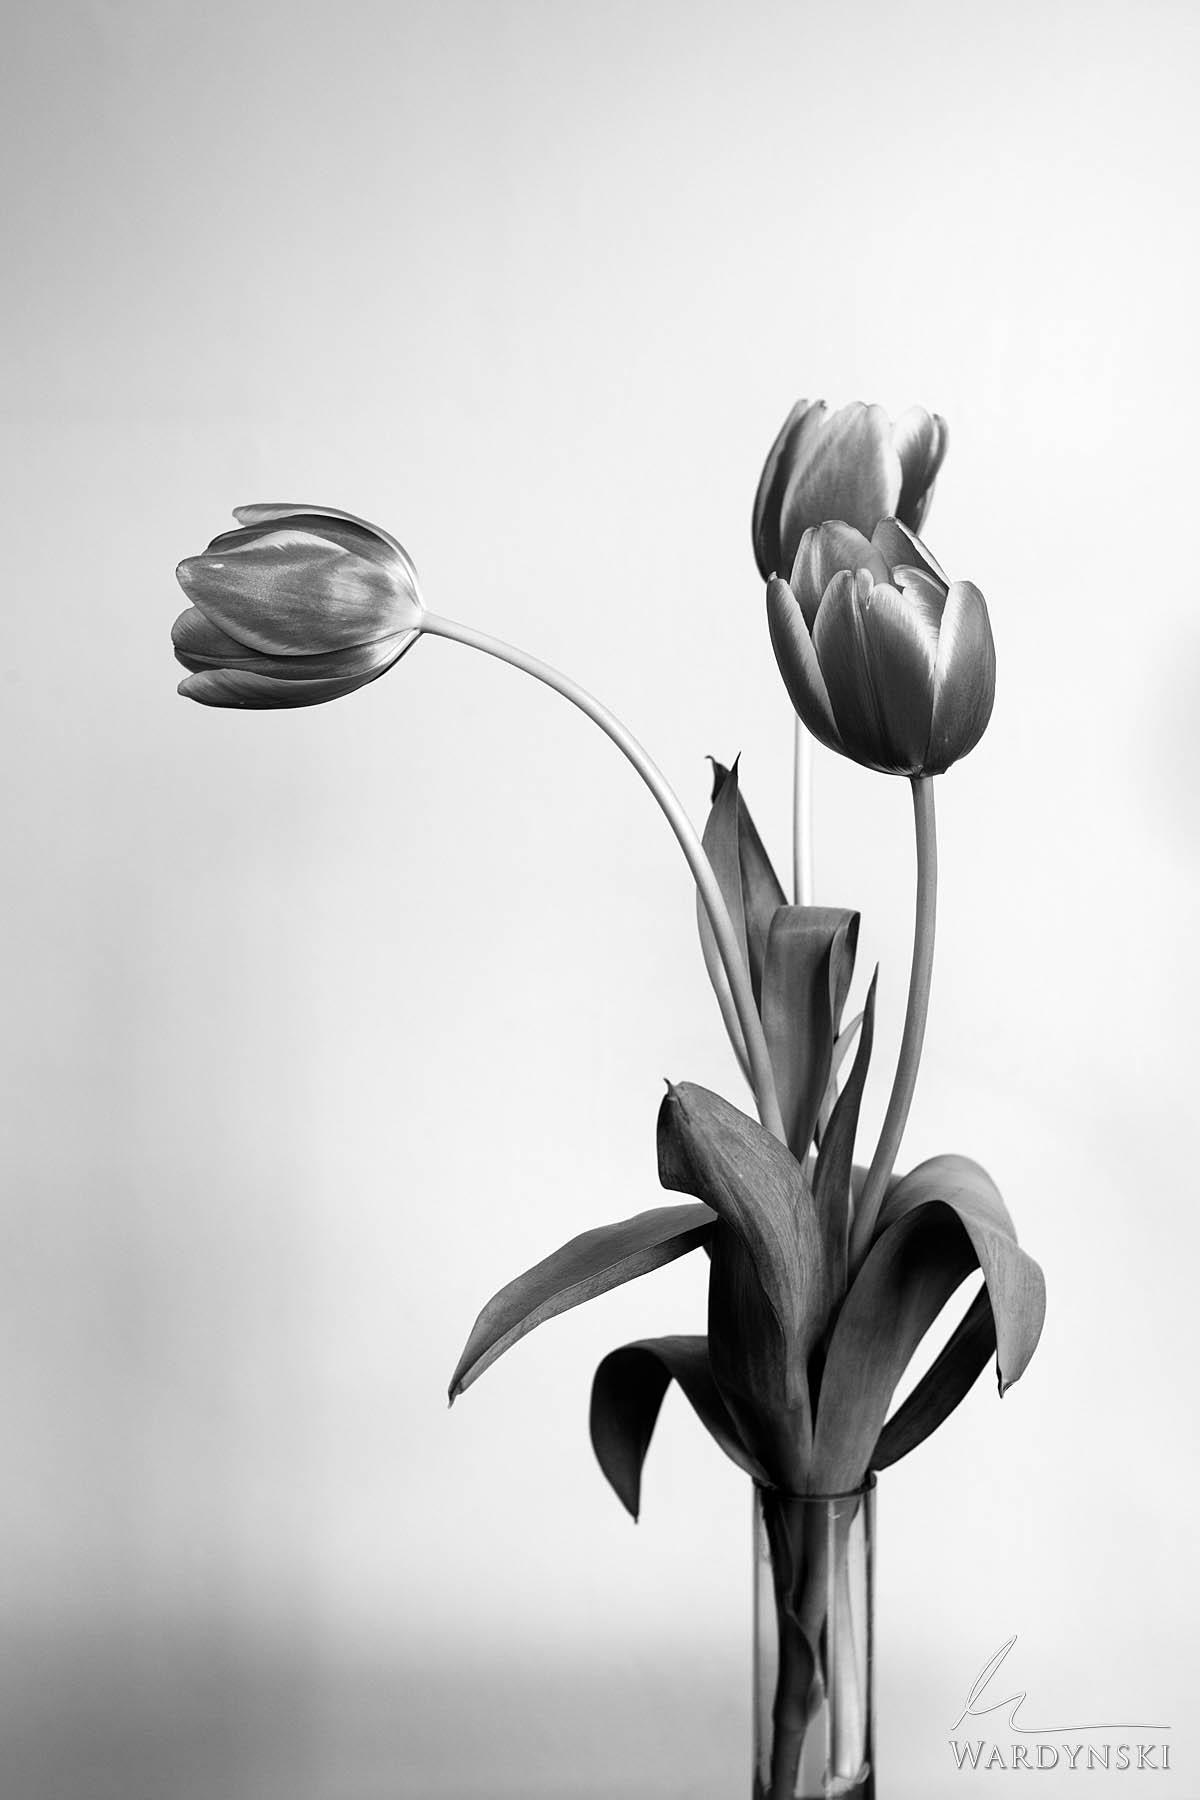 vertical, black and white, b&w, monochrome, flower, high key